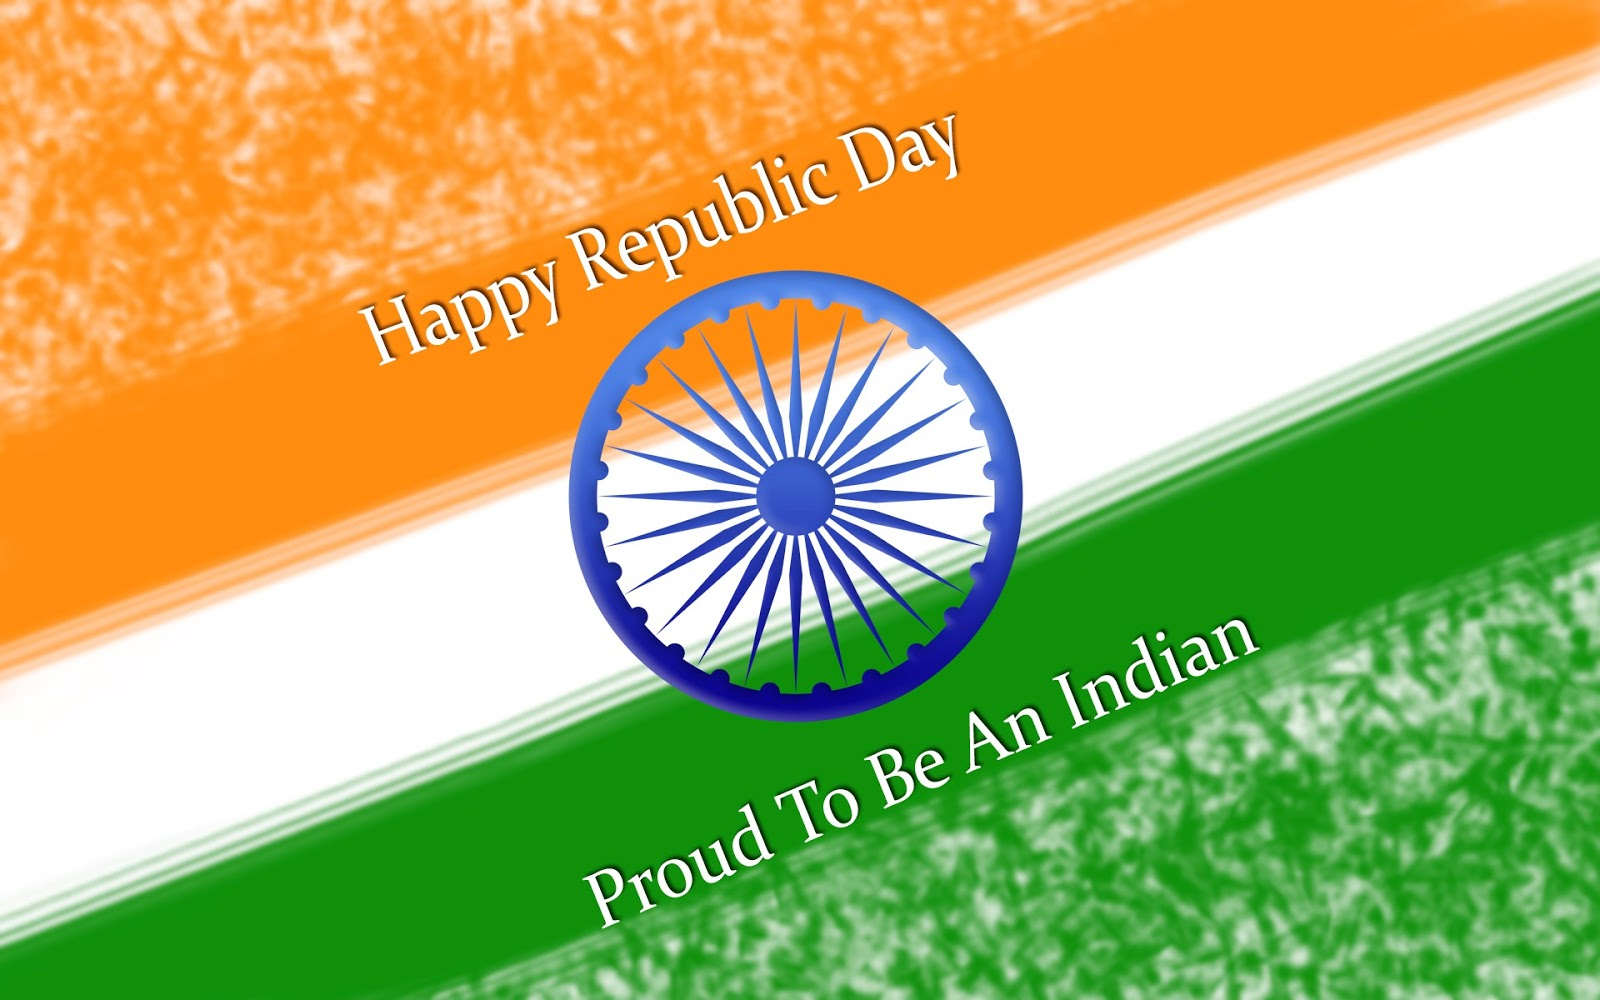 republic day speech in hindi speech in hindi republic day 2017